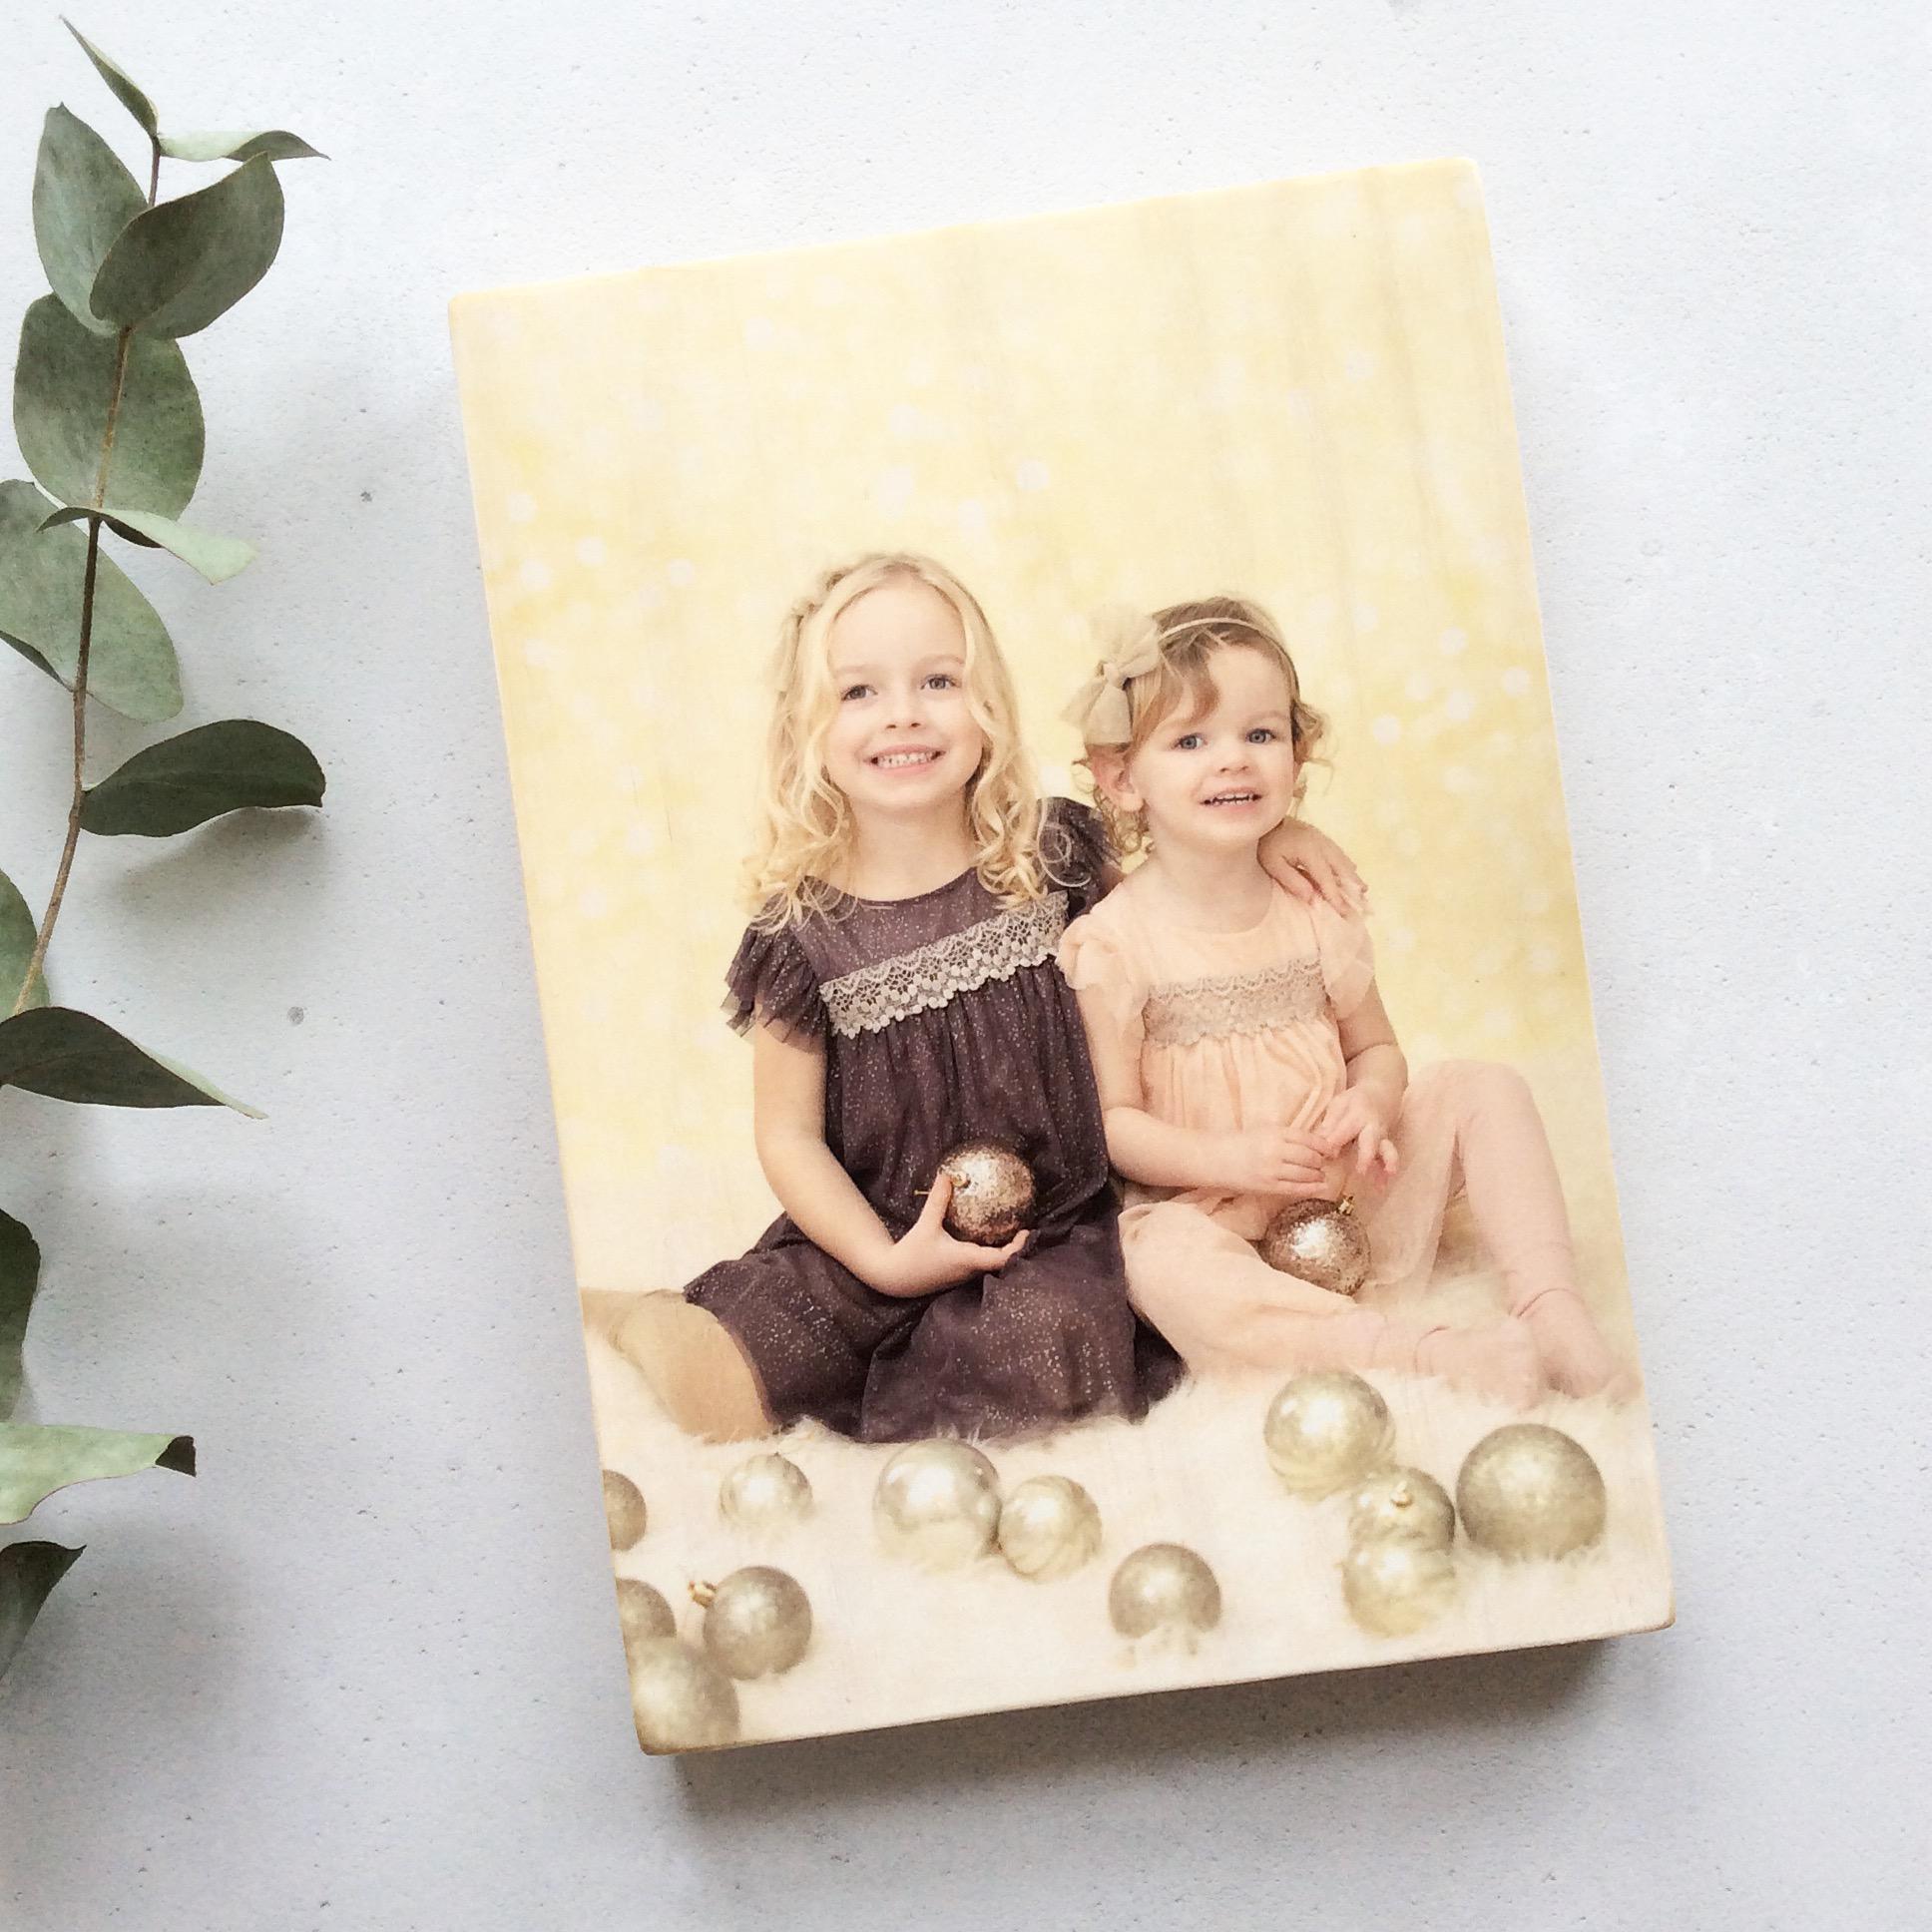 Personalised Wooden Photo Block - Large